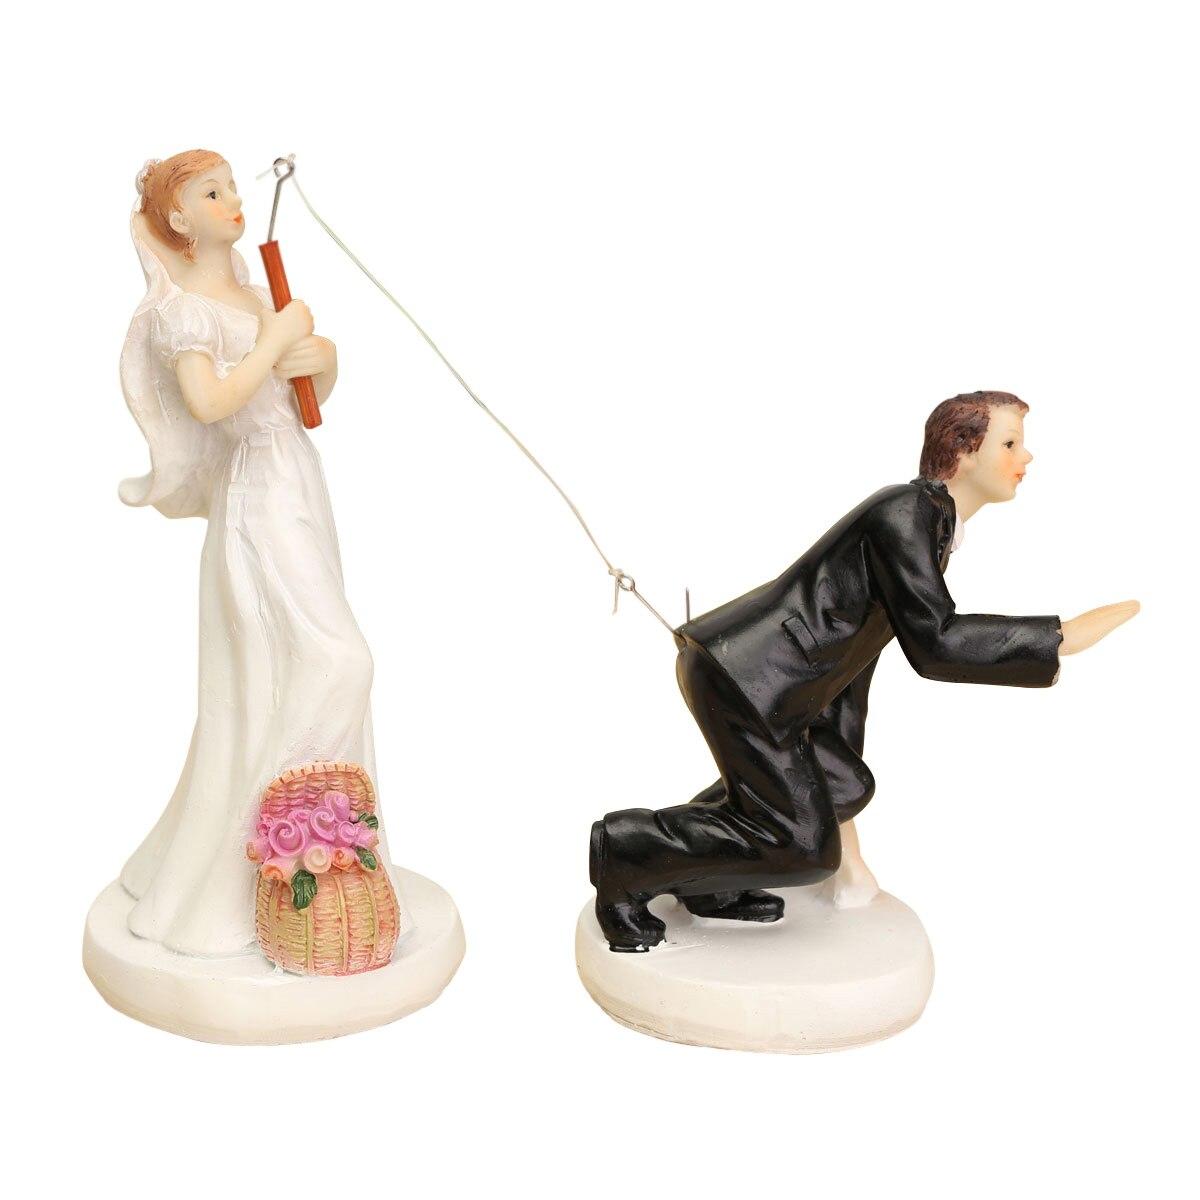 HOT SALE FUNNY ROMANTIC WEDDING CAKE TOPPER FIGURE BRIDE GROOM COUPLE BRIDAL Groom hooked